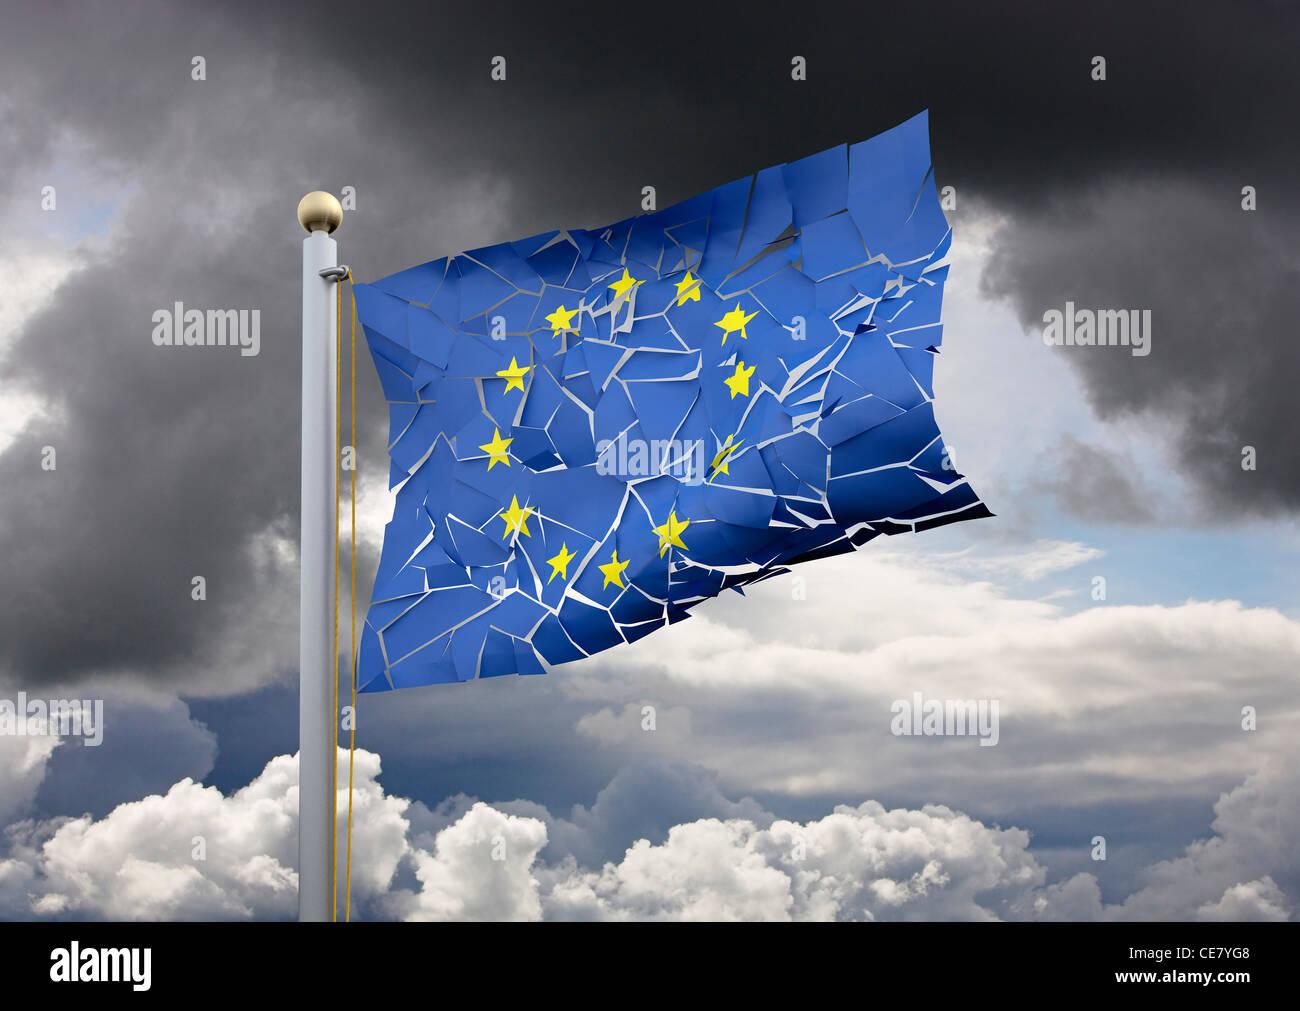 Risse EU-Flagge - Brexit Konzept Referendum/euro Brechen der Eurozone Europäische Union / Europa Krise Konzepte Stockbild